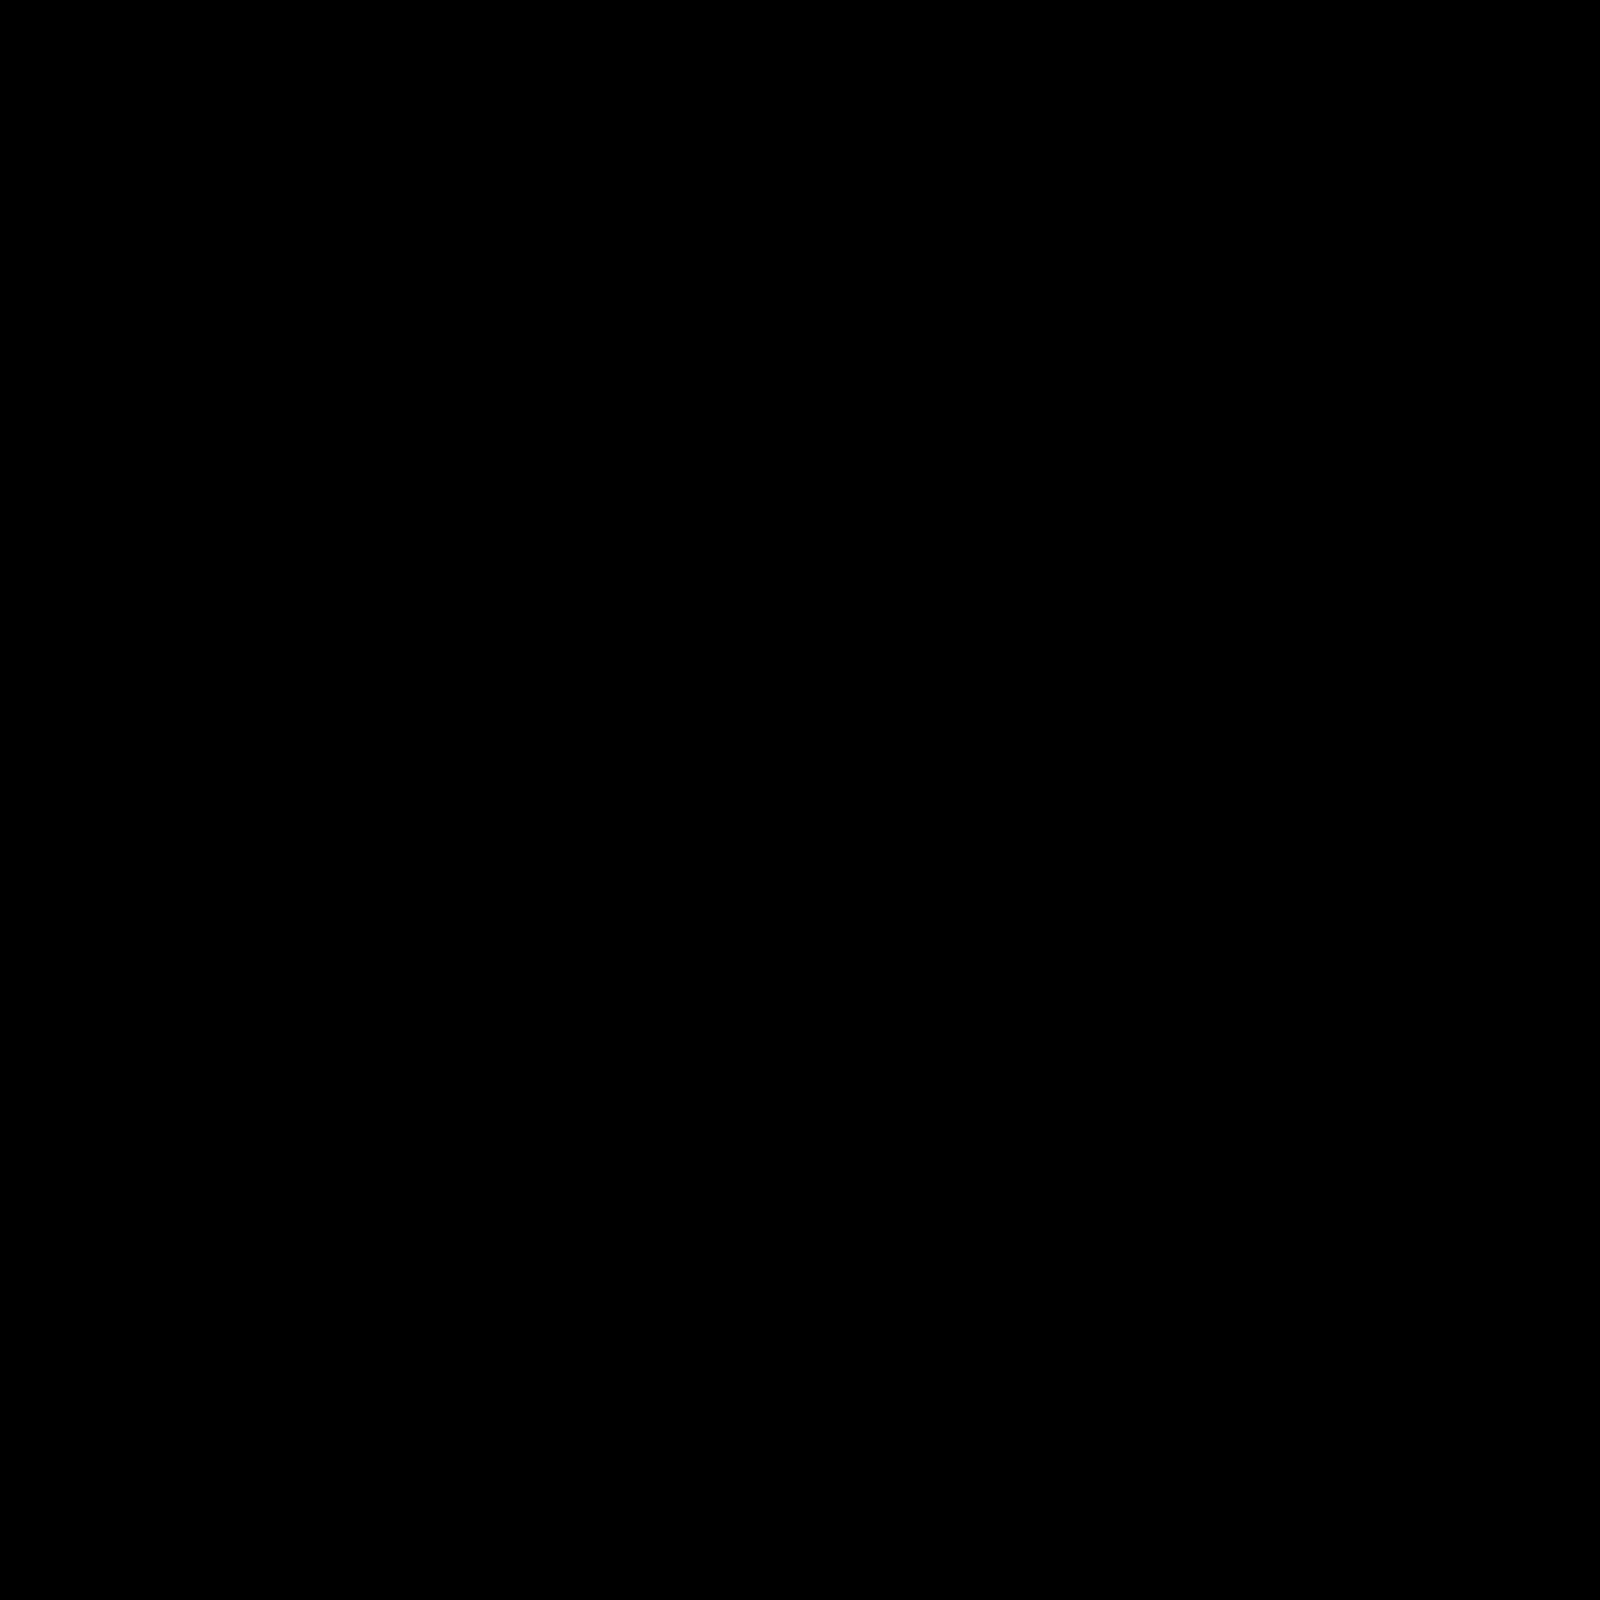 Waage Icon